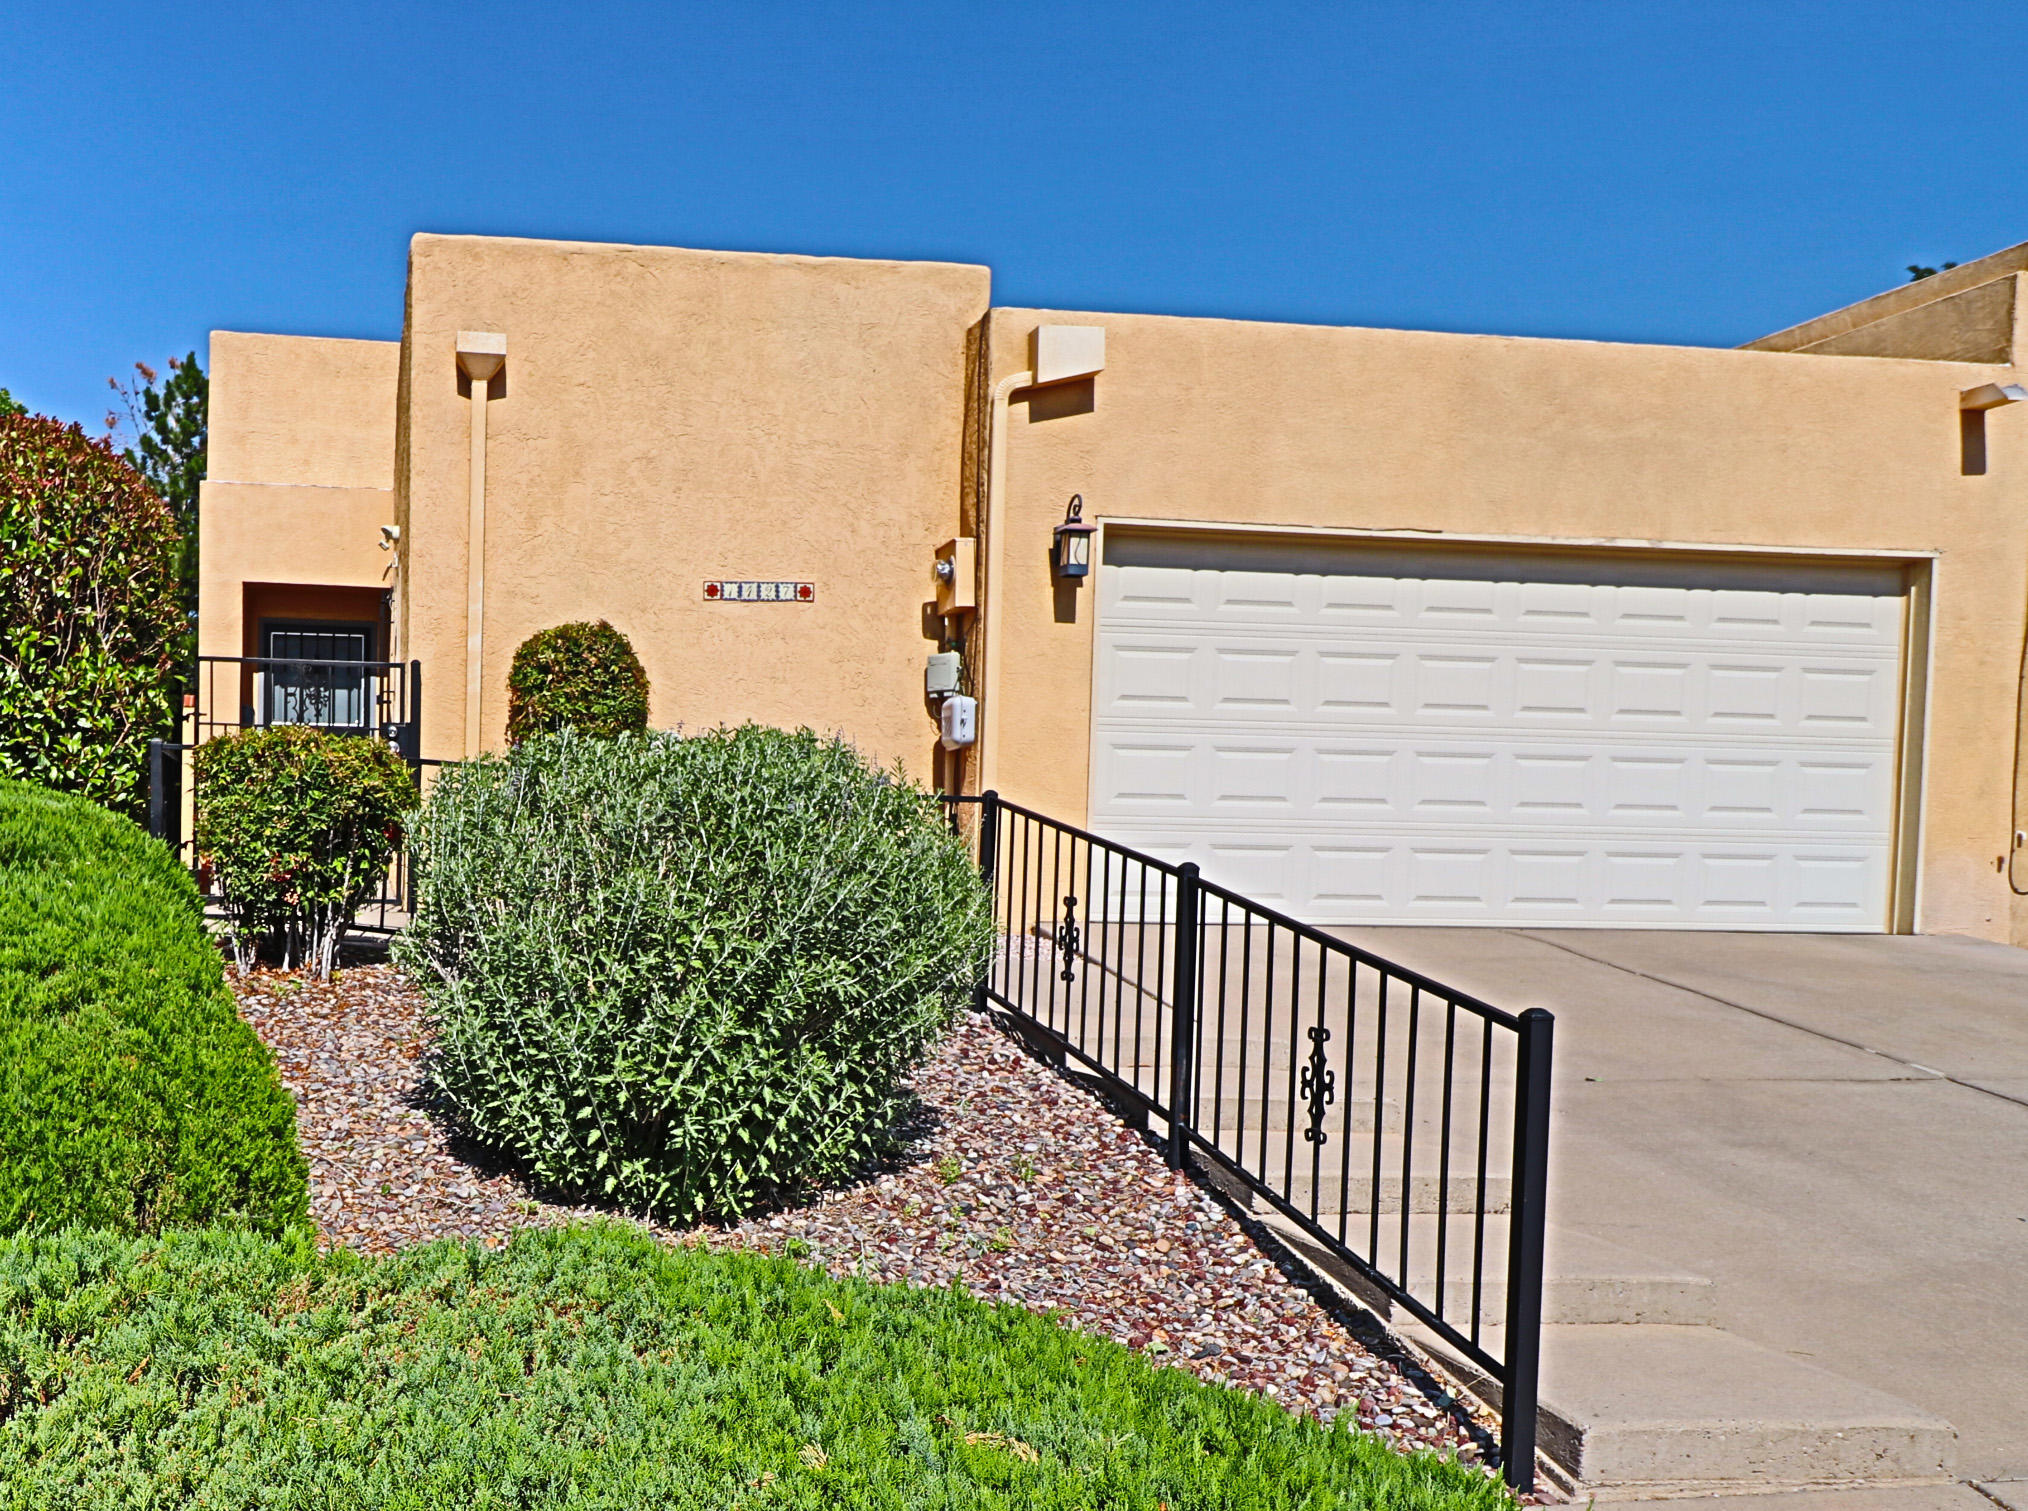 1427 CUMBRES NE Property Photo - Albuquerque, NM real estate listing